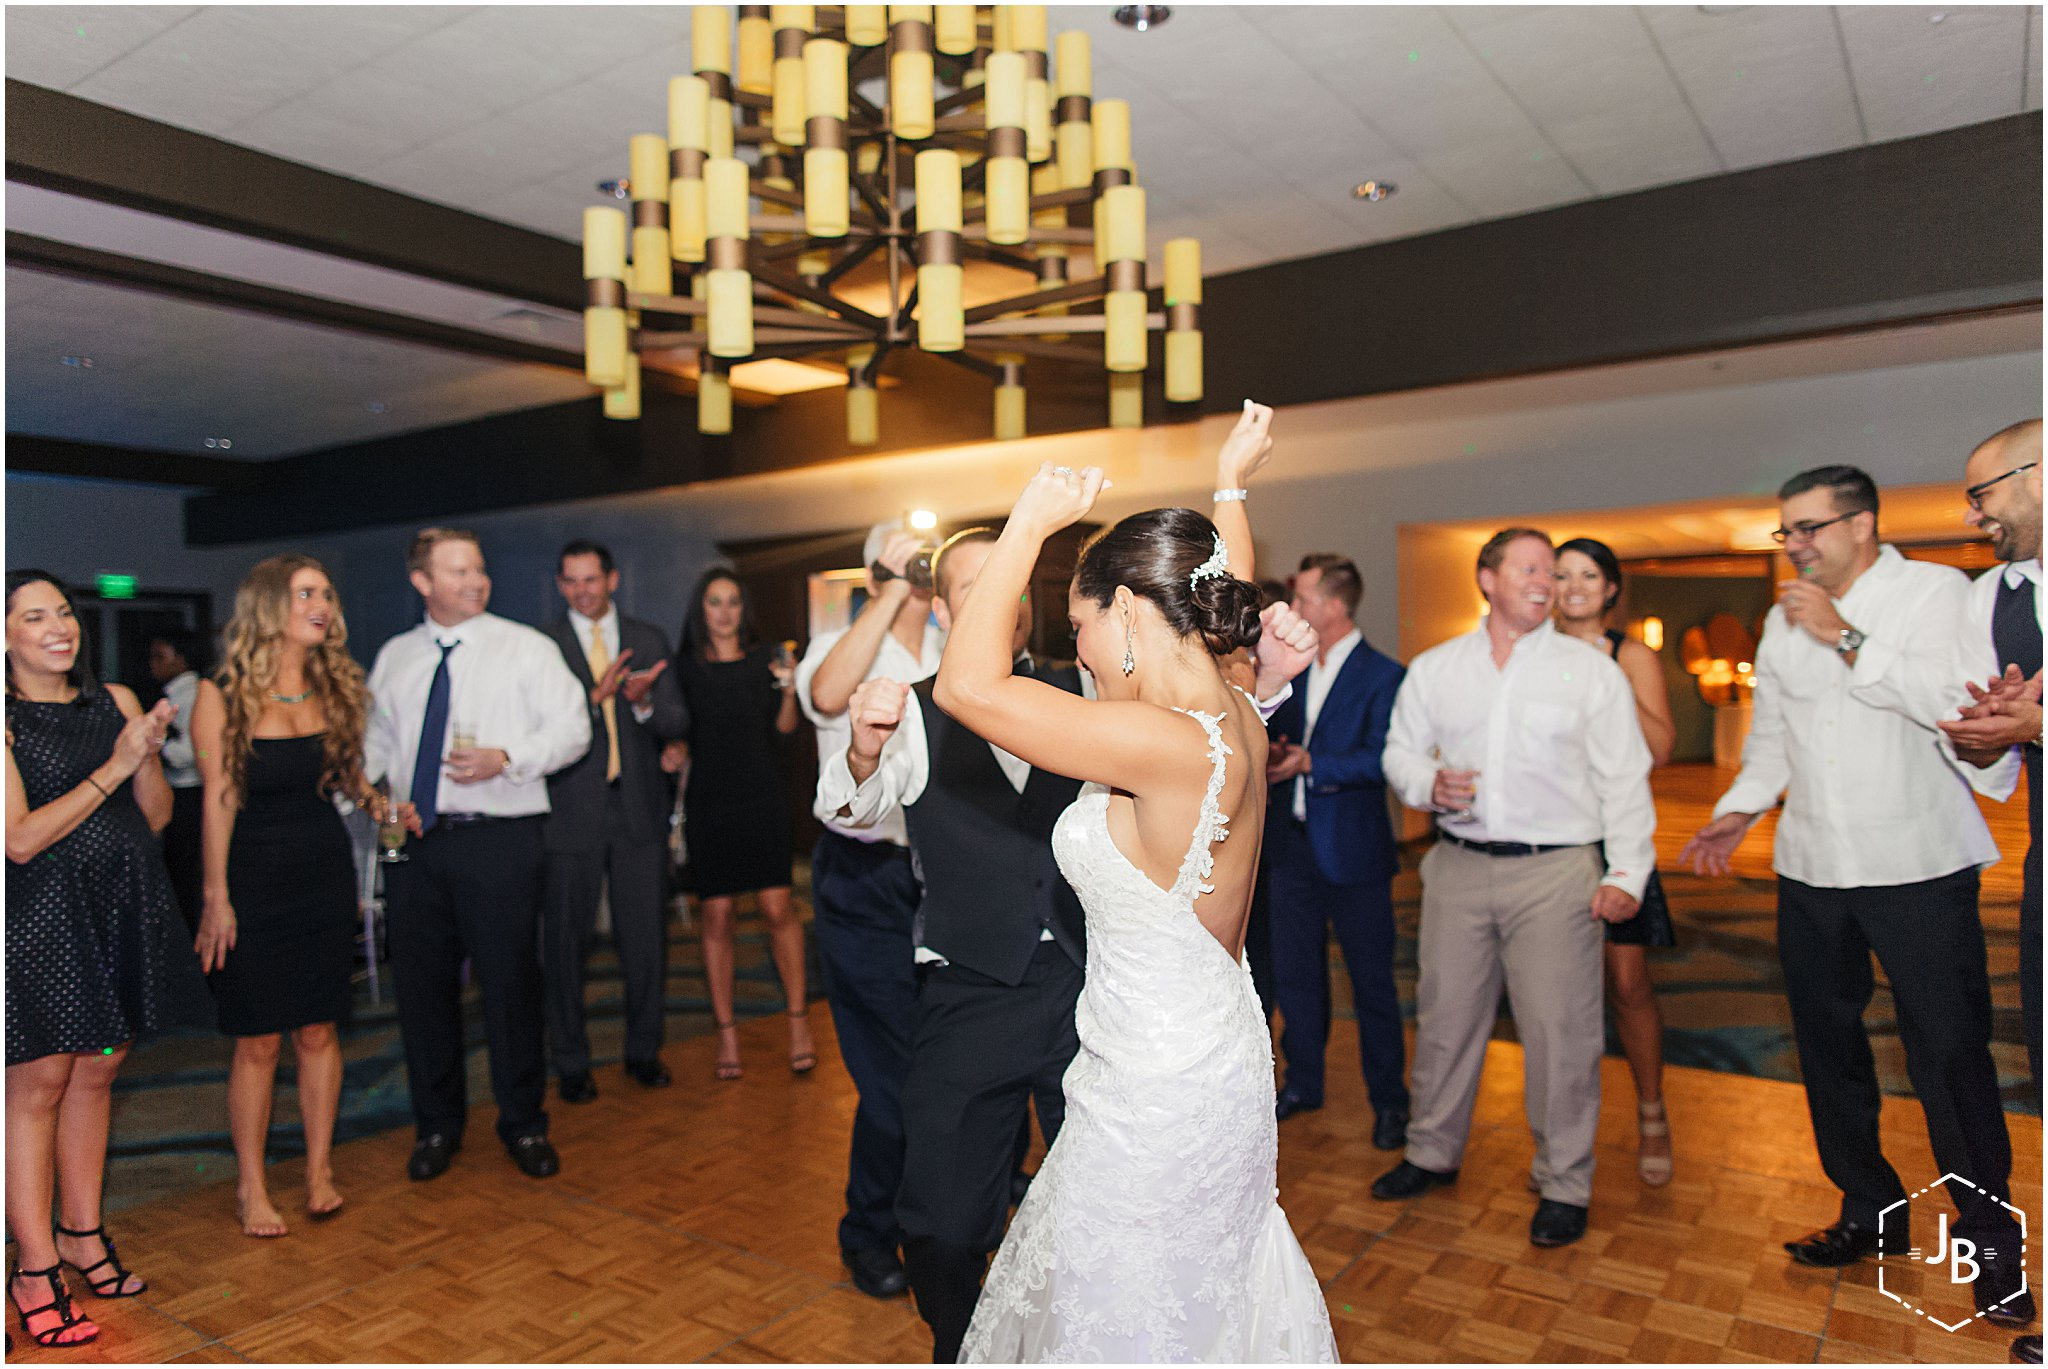 WeddingandEngagementFloridaPhotographer_0284.jpg